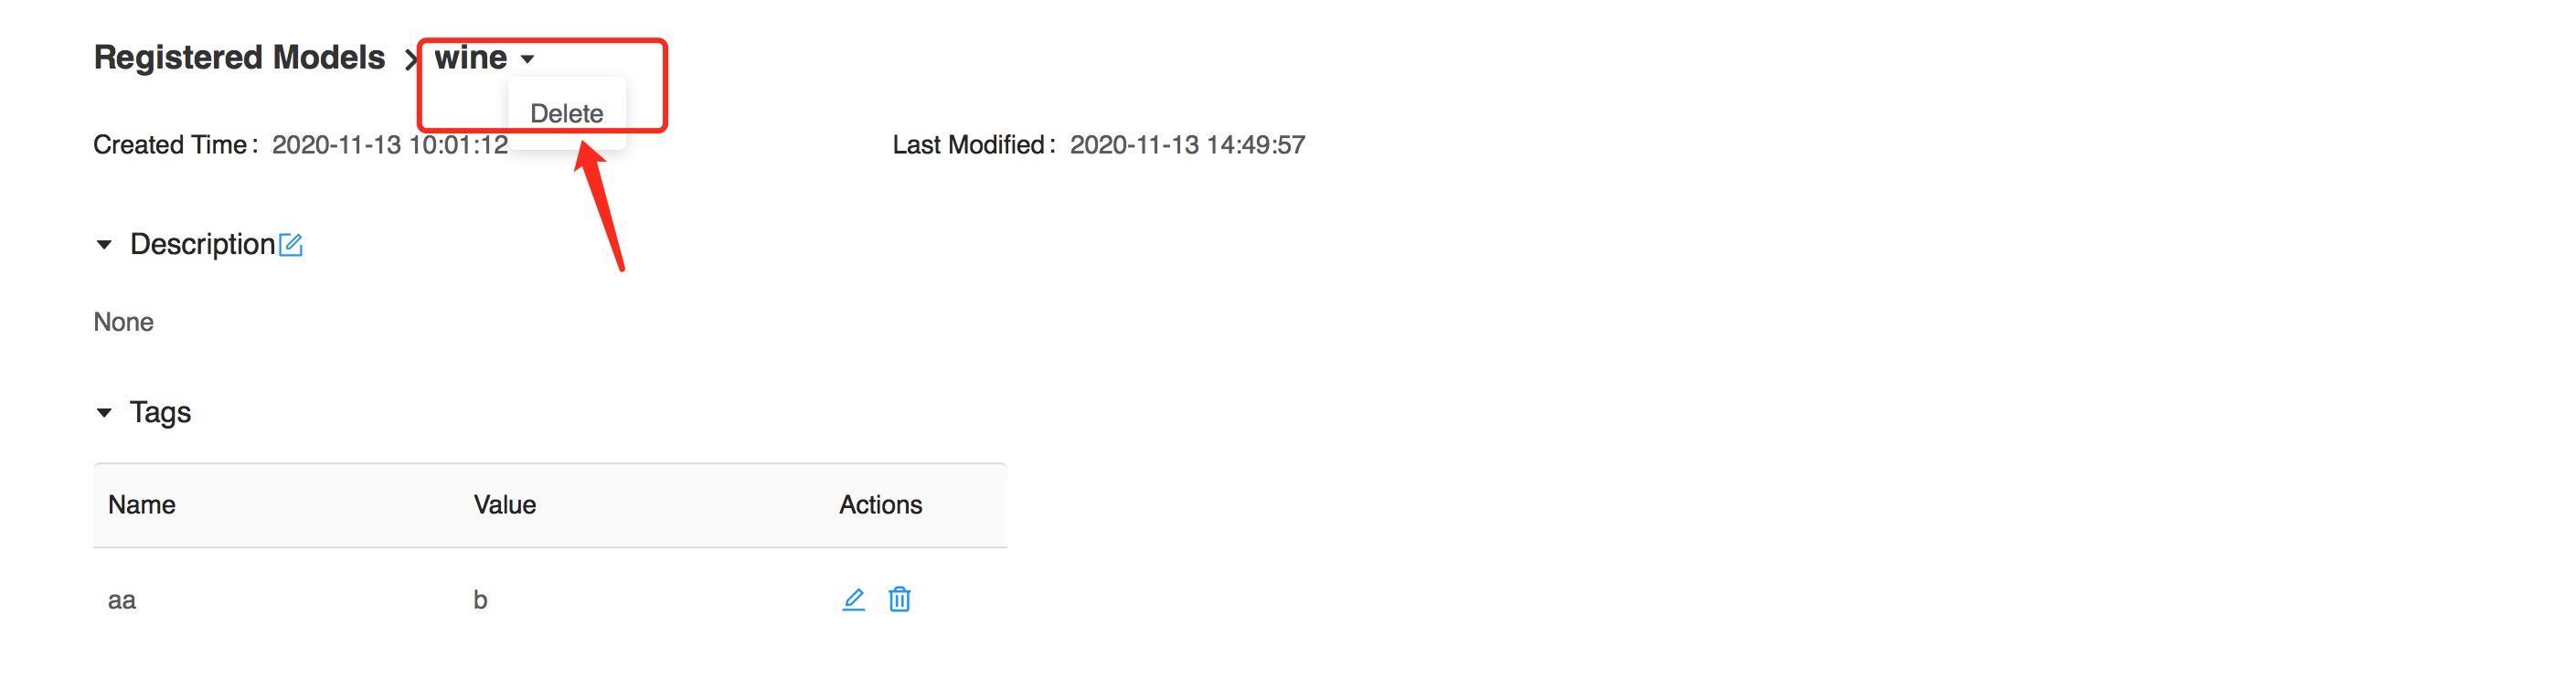 【mflow系列6】mlflow model registry